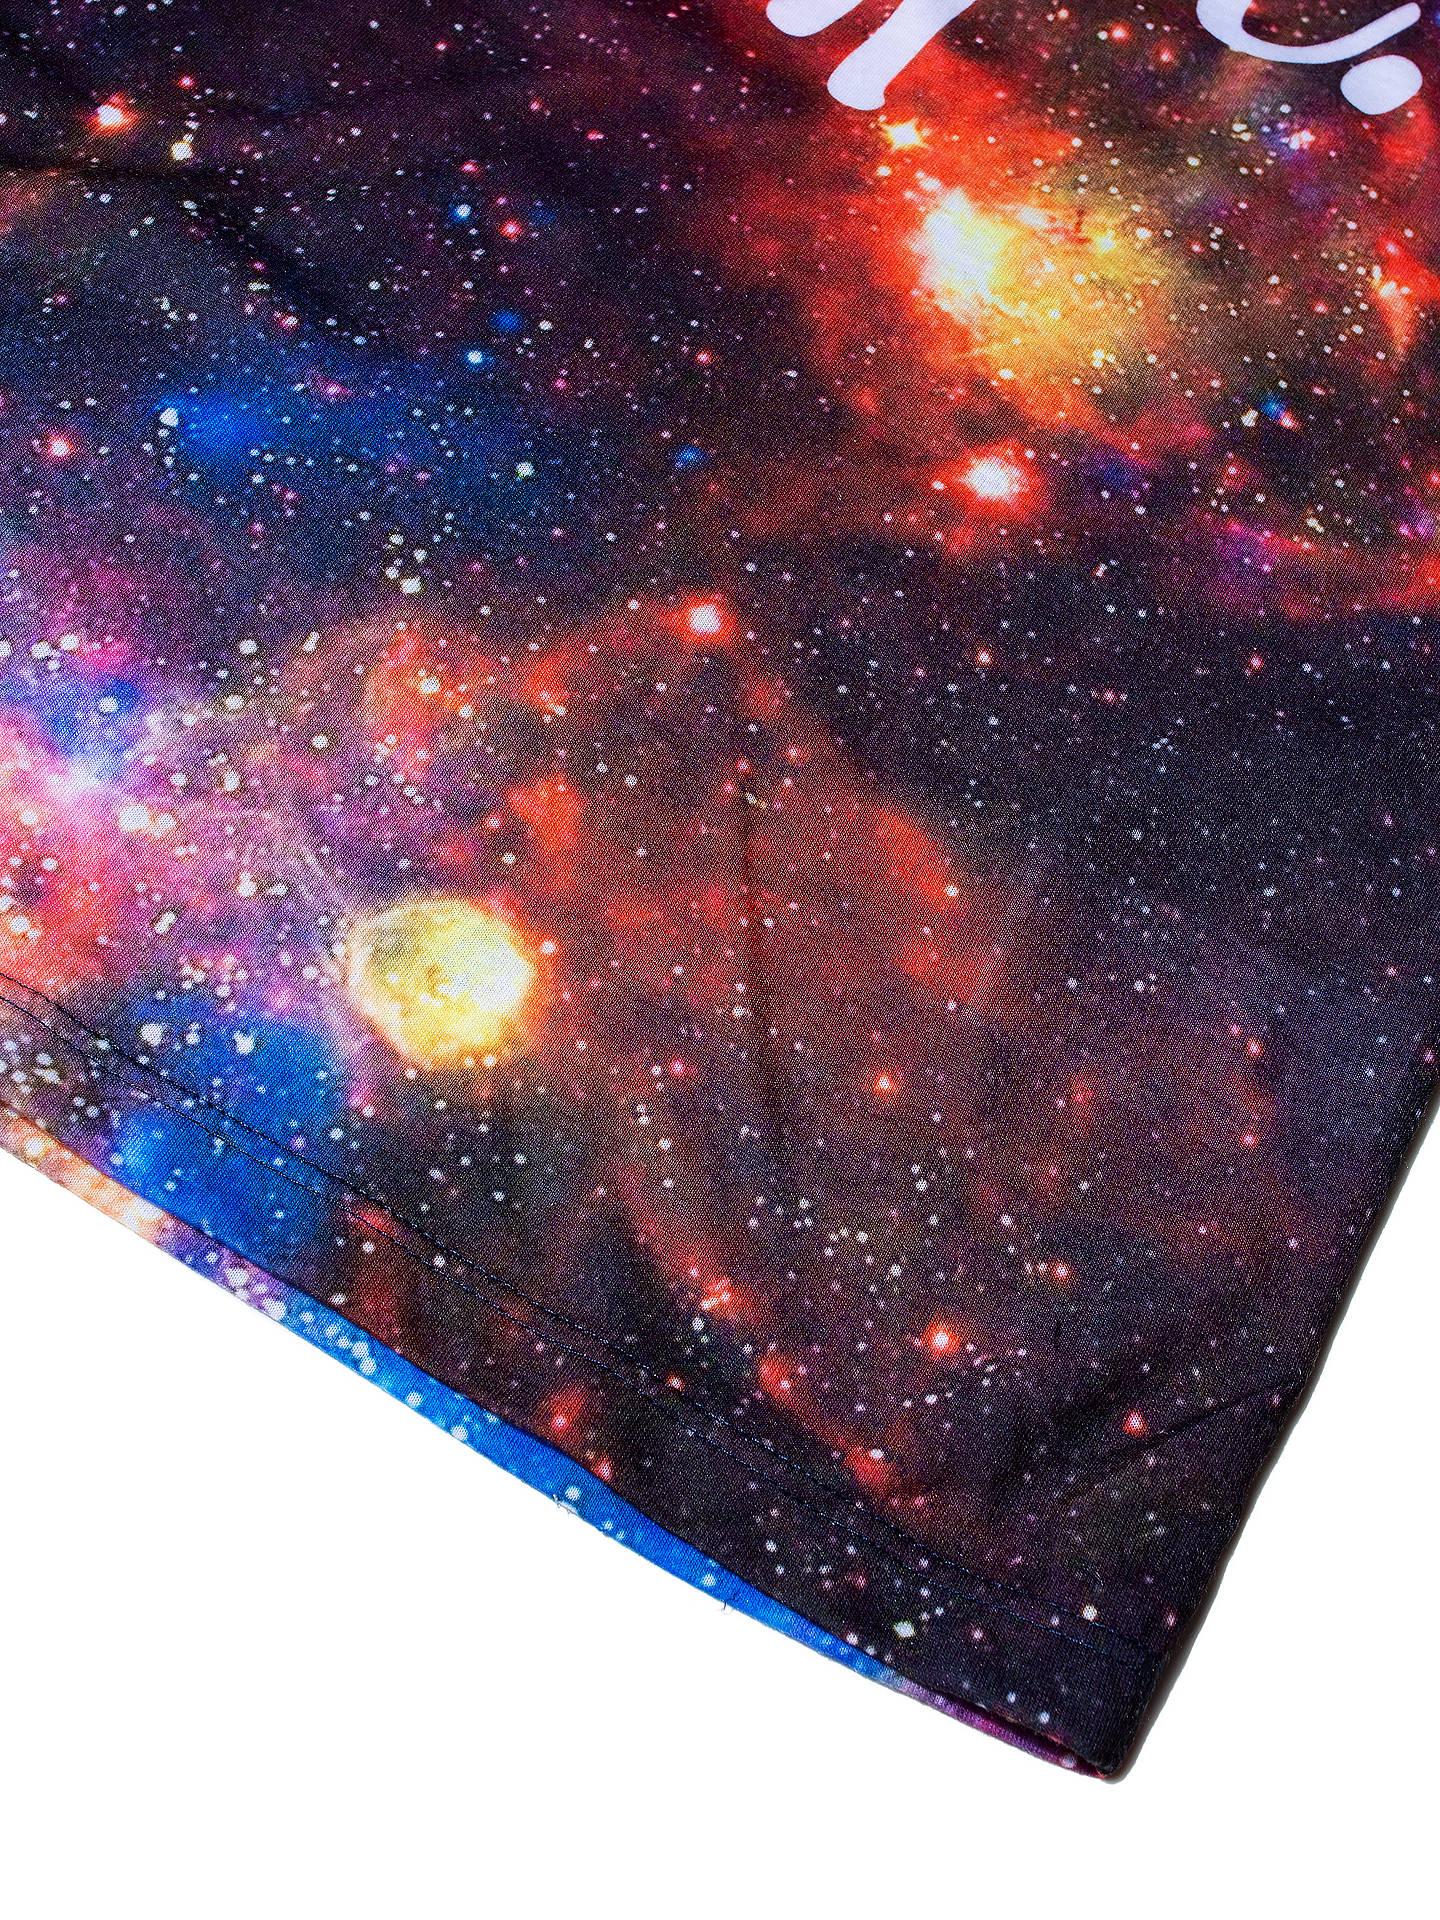 ea5c8b59 Hype Boys' Space Print T-Shirt, Multi at John Lewis & Partners